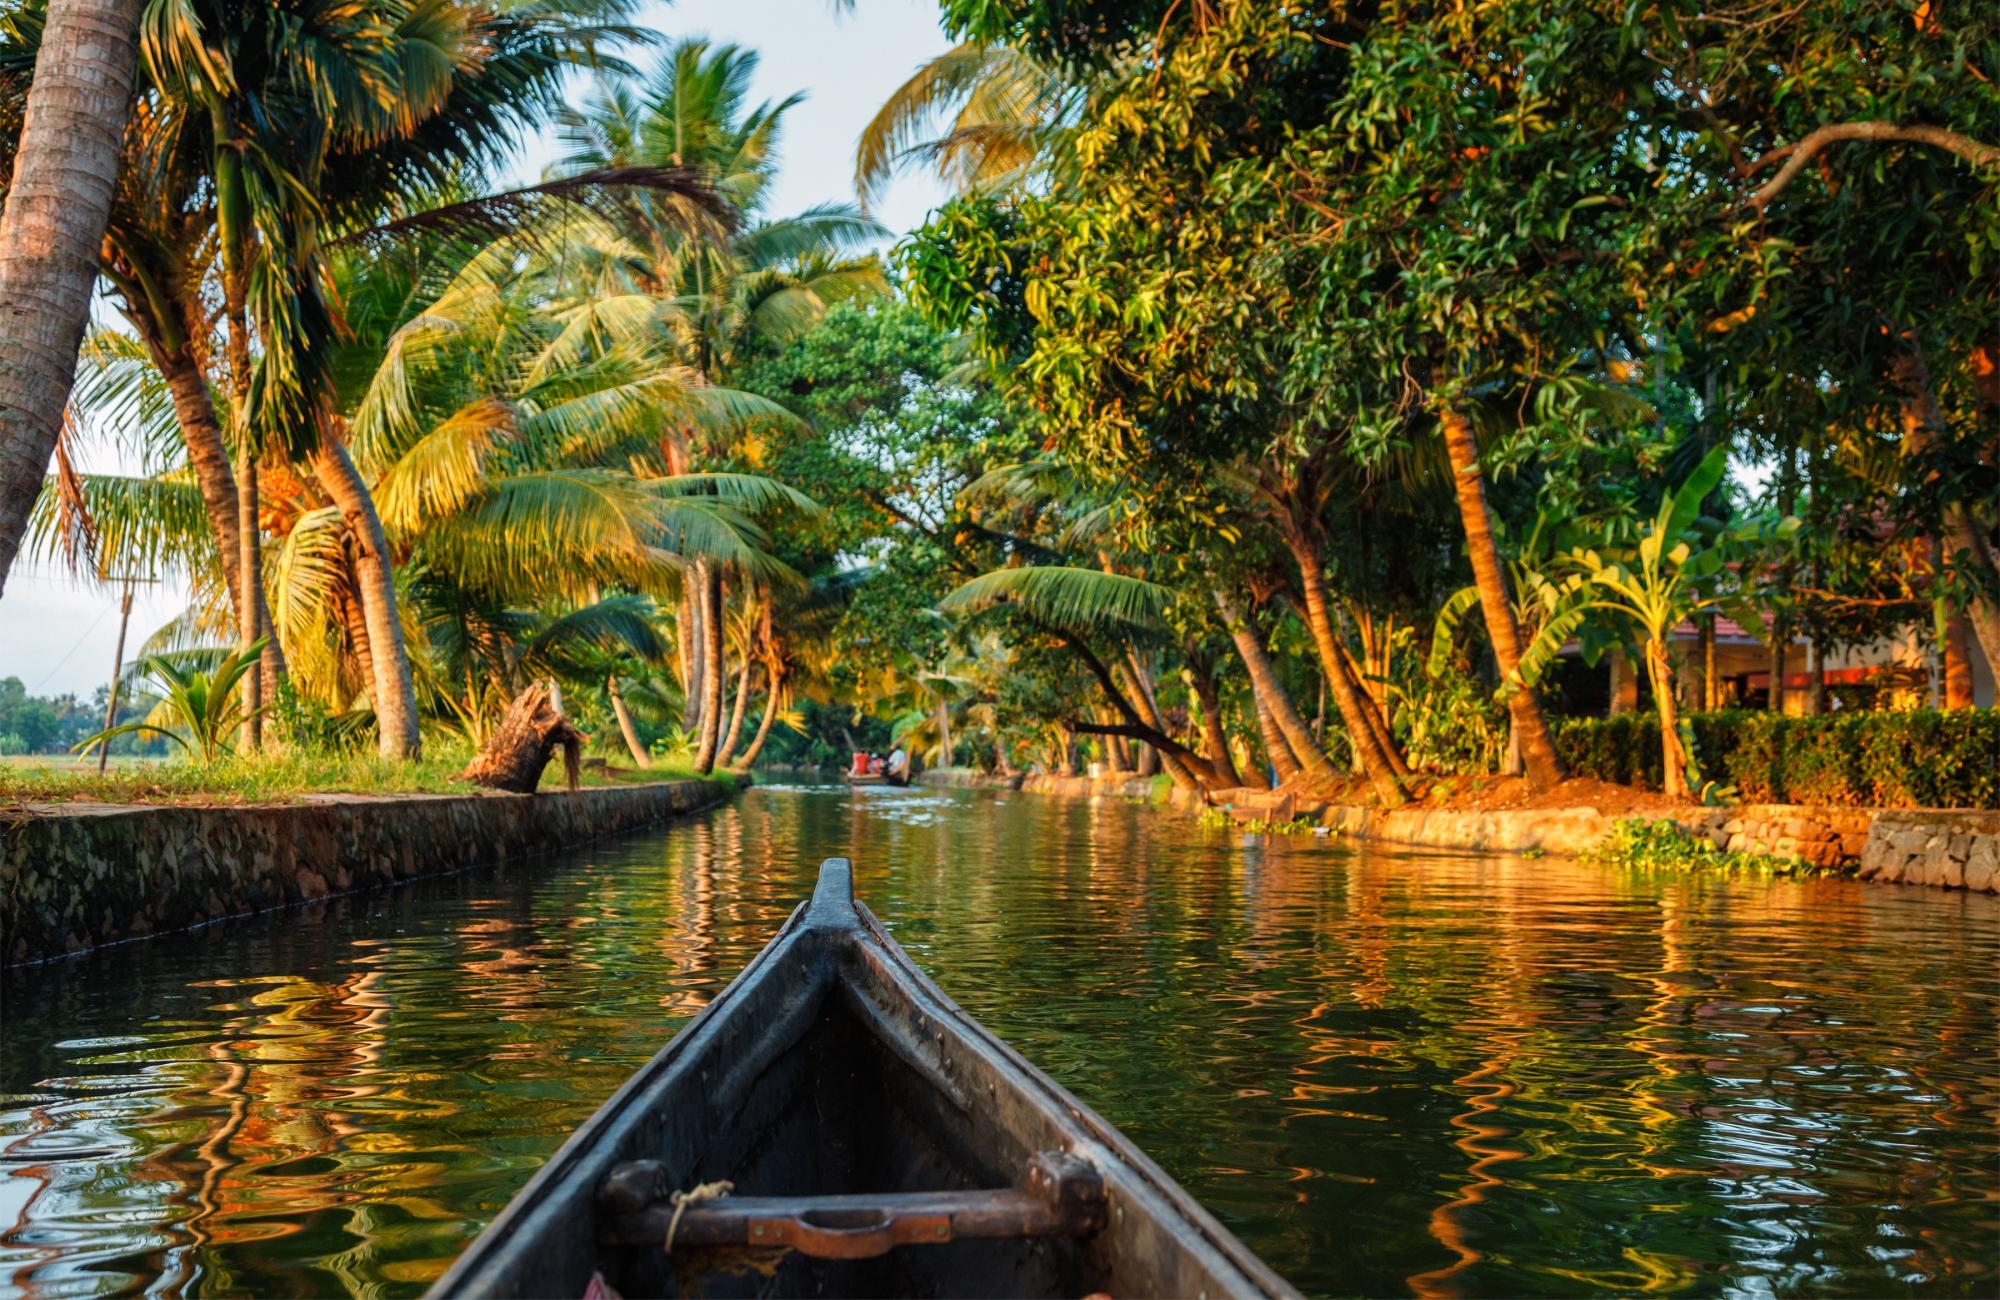 Voyage Inde - Backwaters Kerala - Amplitudes